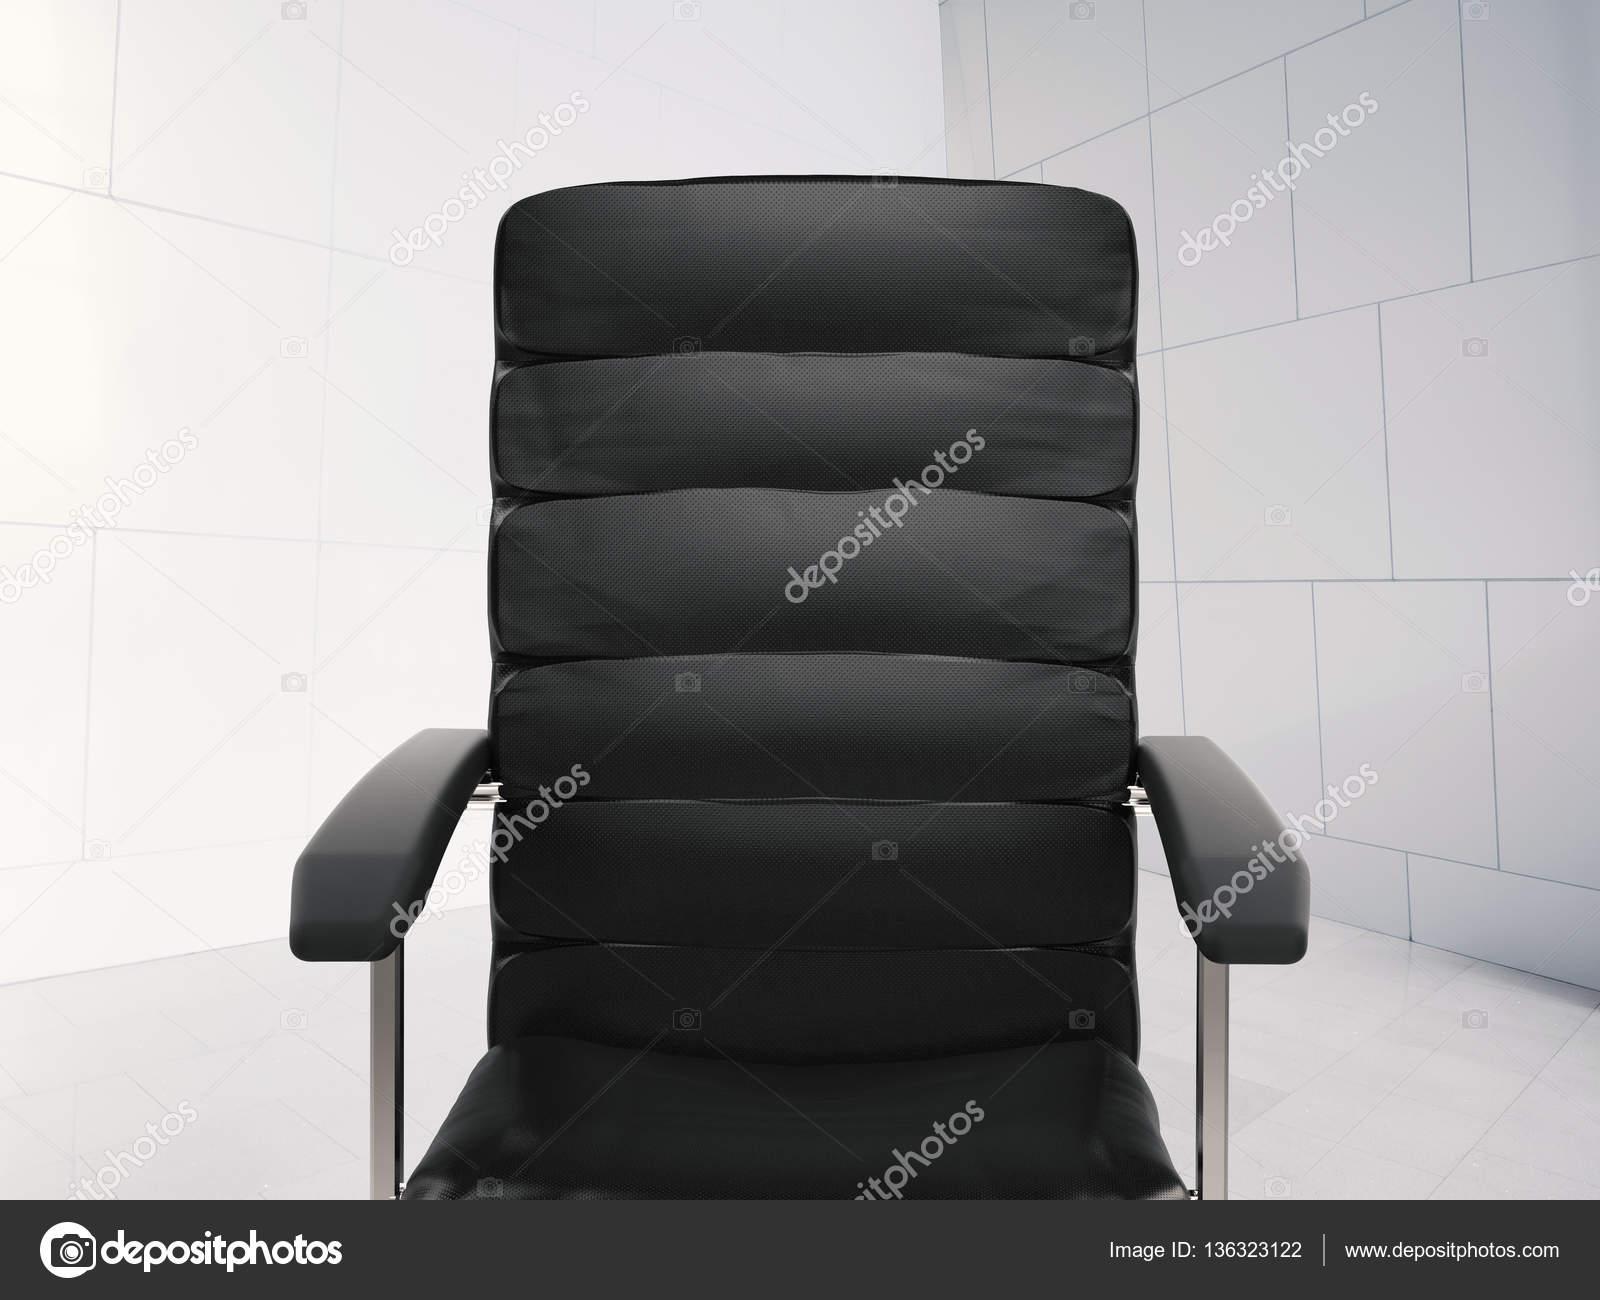 Sedie Da Ufficio In Pelle : Sedia da ufficio in pelle nera u2014 foto stock © phonlamai #136323122